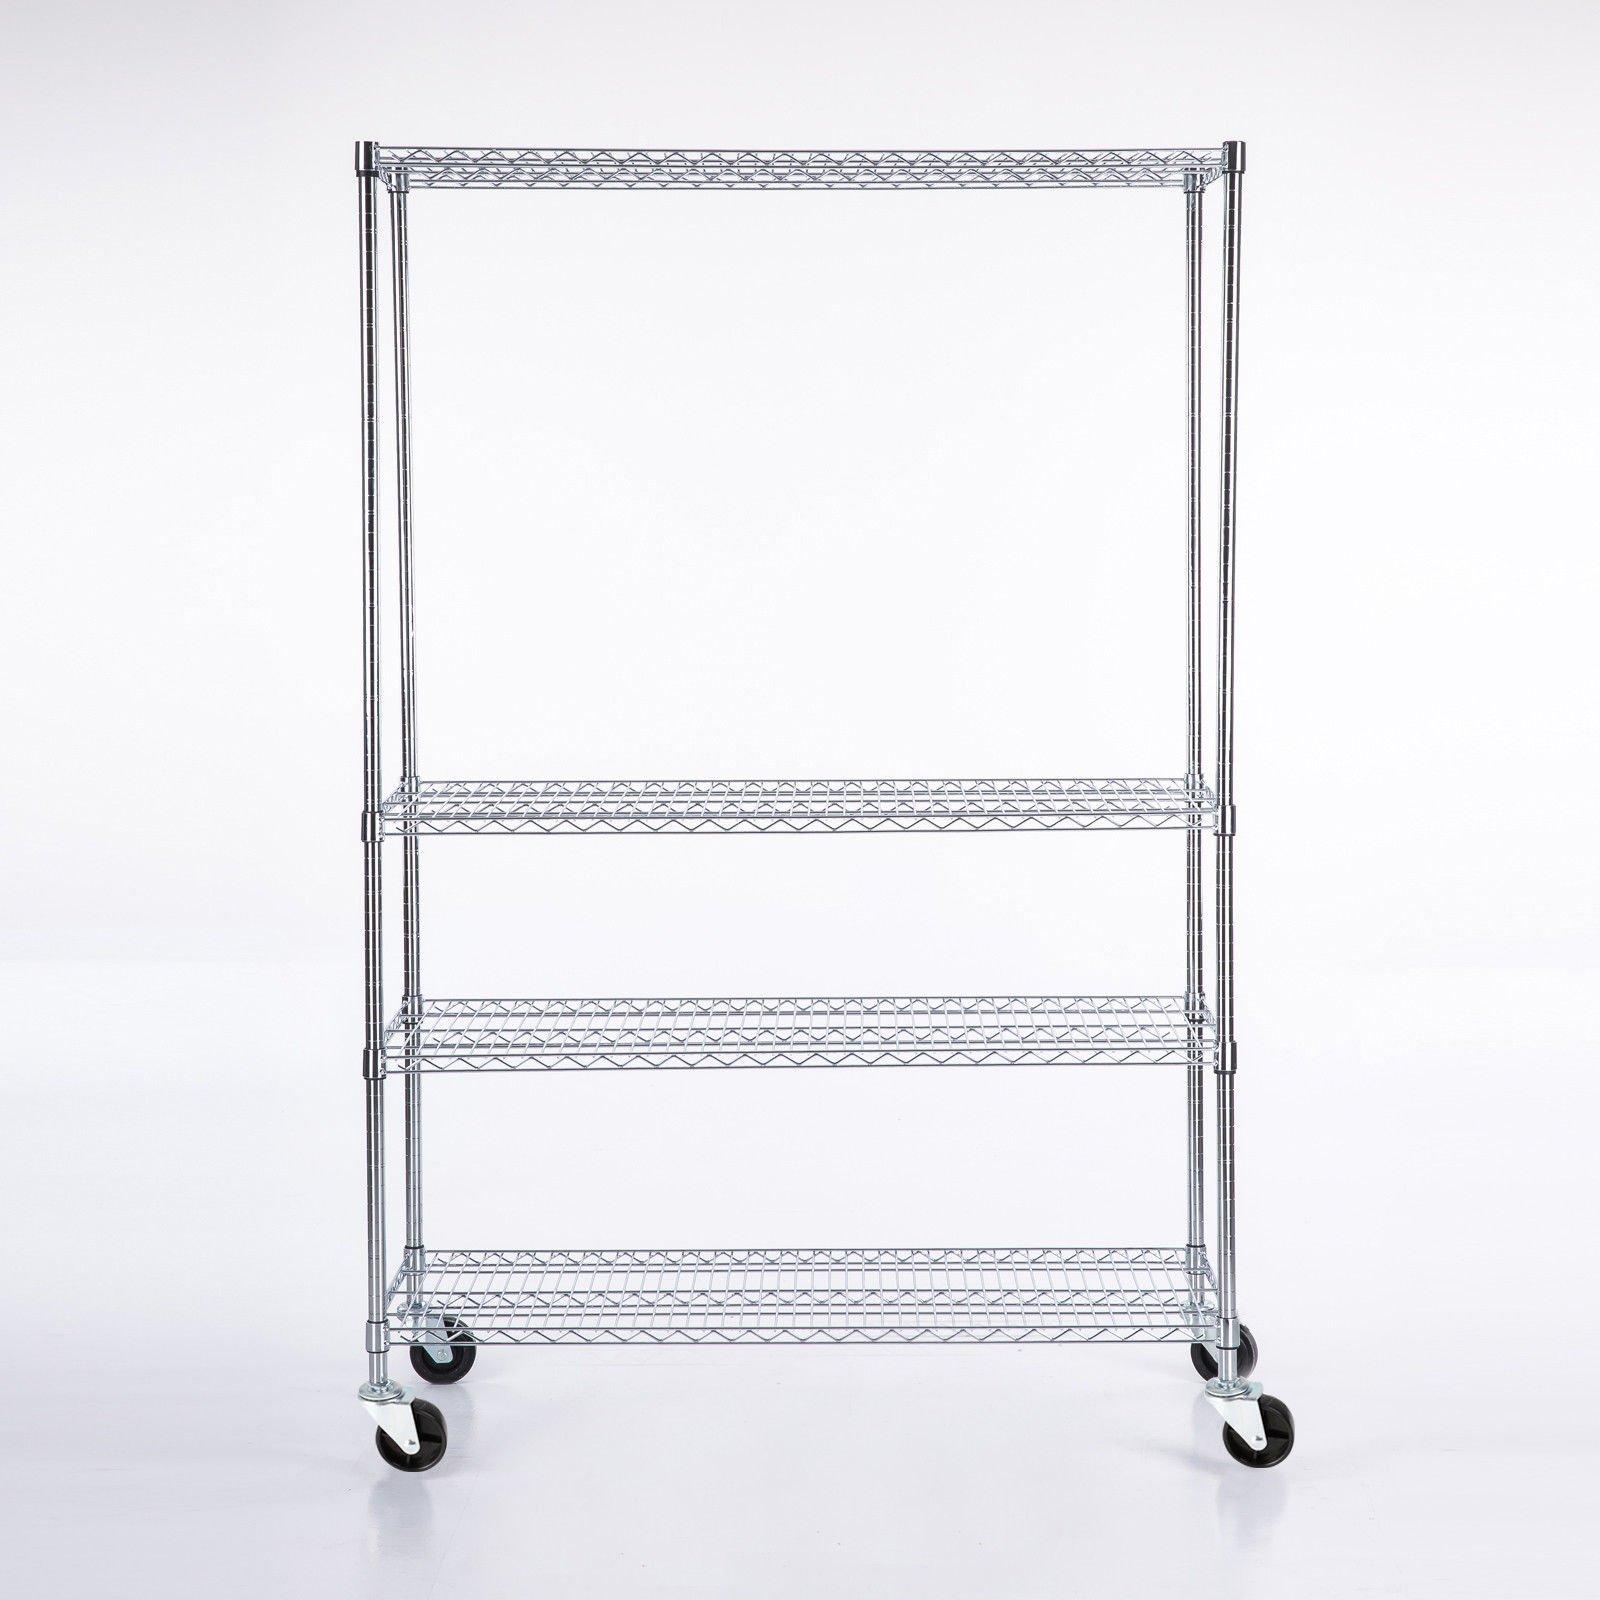 4Tier Shelving Adjustable Chrome Rack 82''x48''x18'' Heavy Duty Wire Steel Shelf